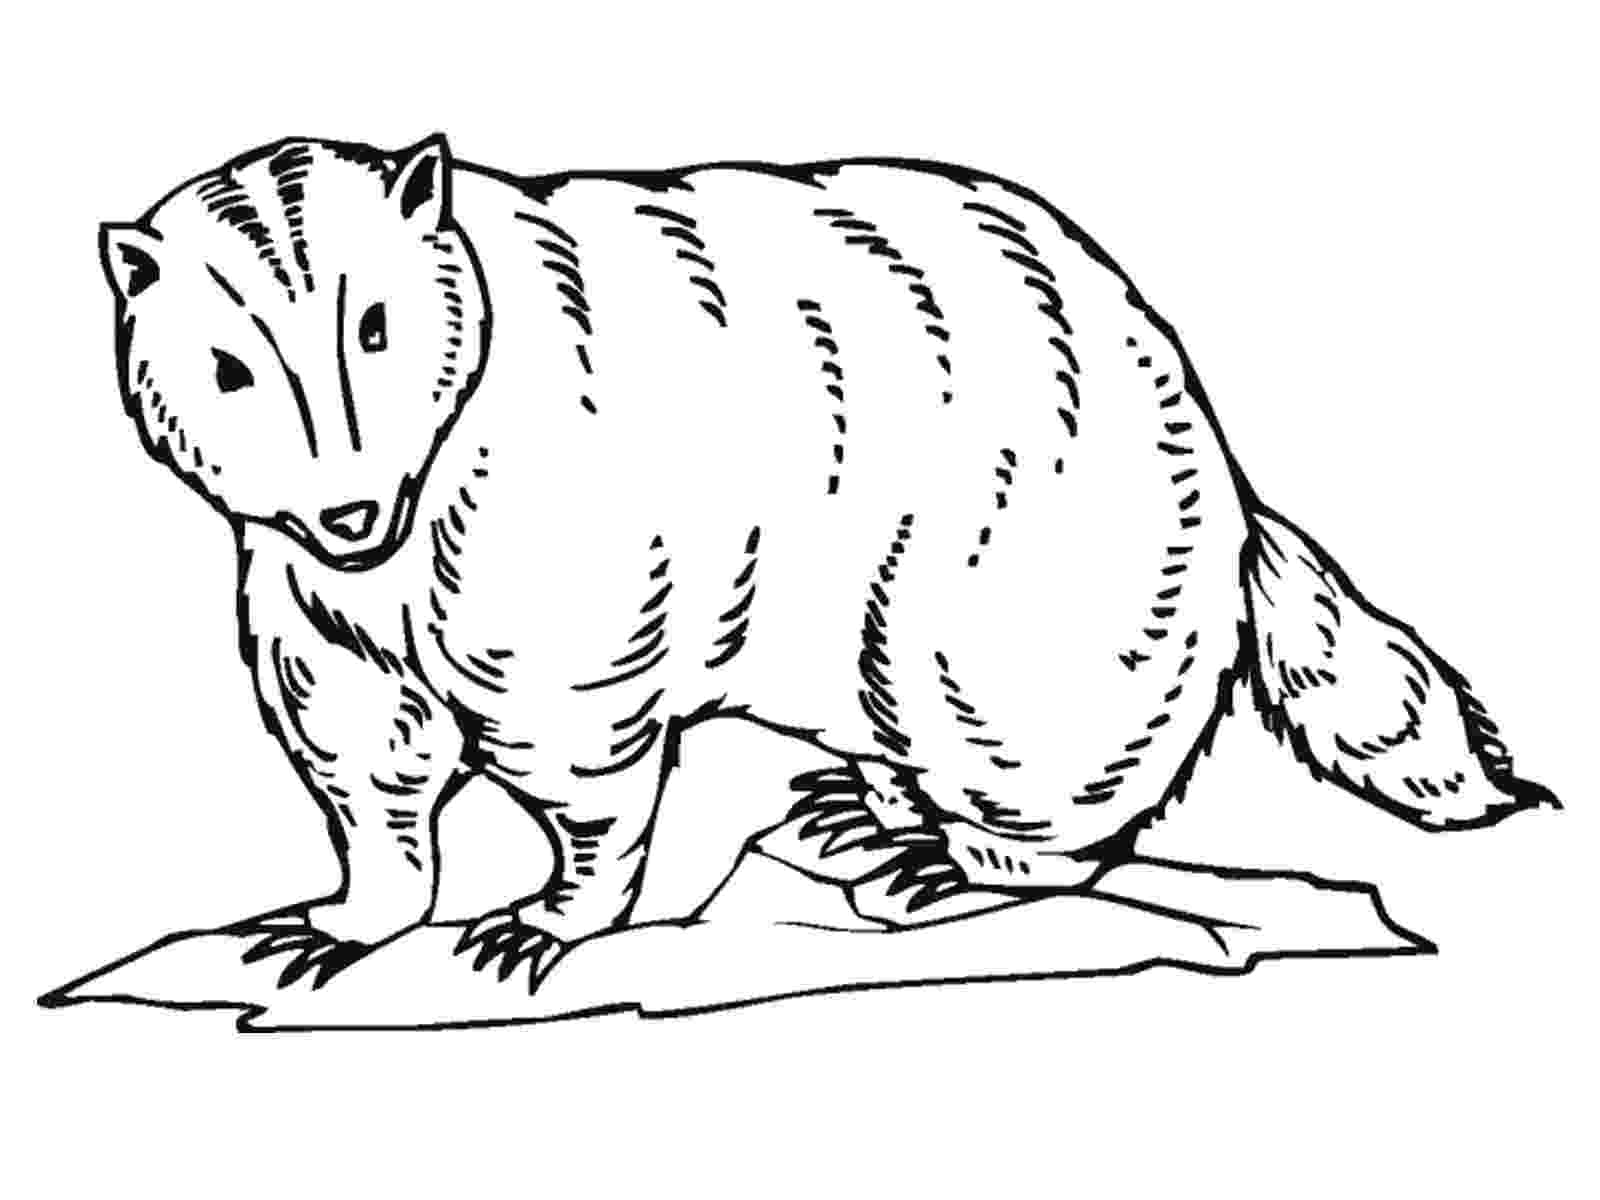 badger coloring page badger coloring page getcoloringpagescom page badger coloring